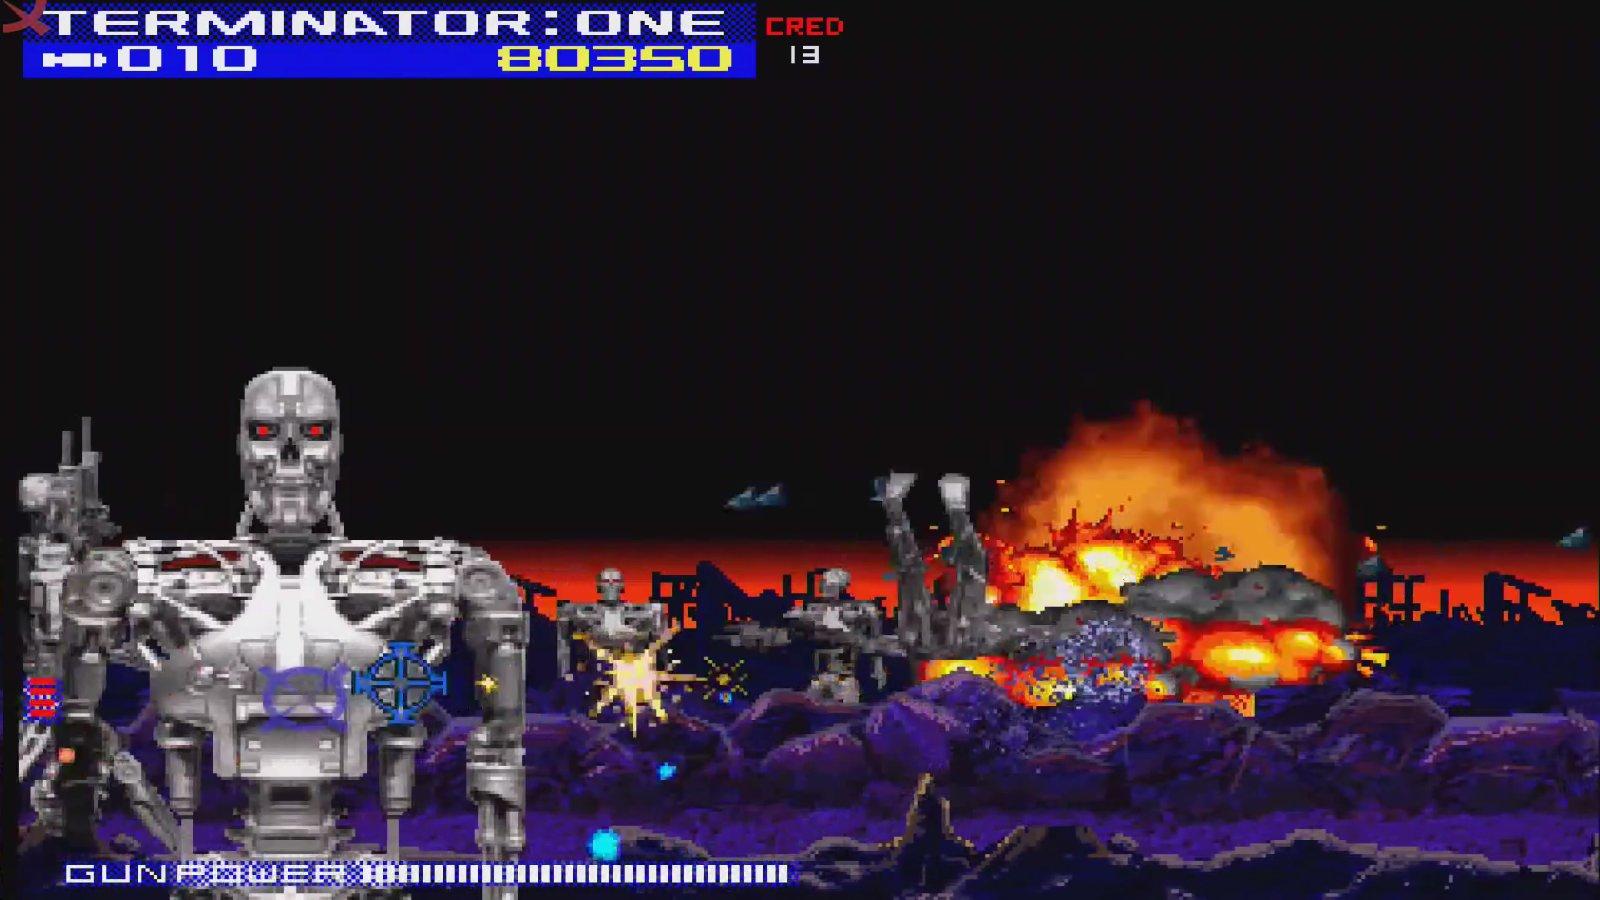 Corona Jumper: Terminator 2: The Arcade Game (Various, 1991